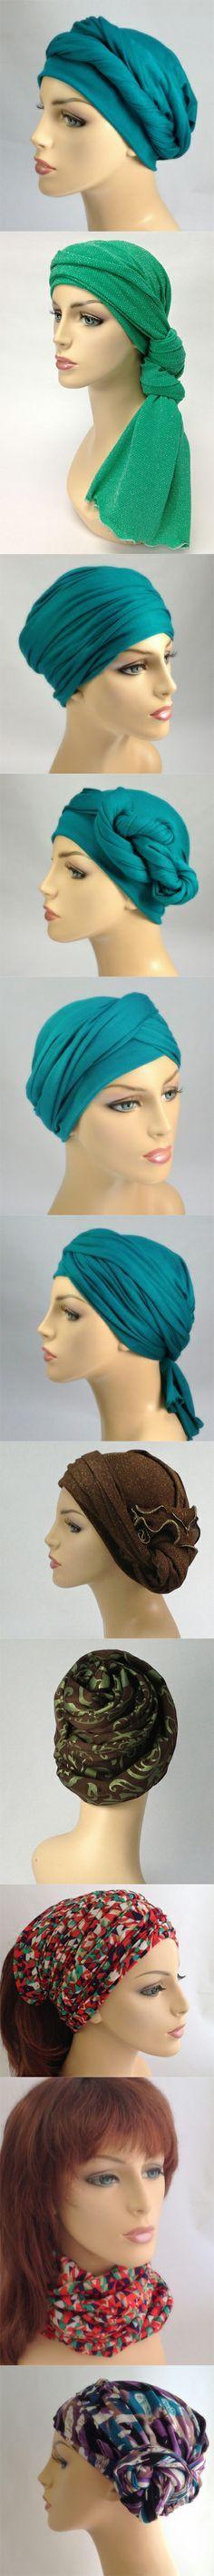 A few of the many ways to style a 1 piece TurbanDiva Wrap! So easy & no slipping when you wrap! http://www.turbandiva.com/TURBAN-HEAD-WRAPS-One-Piece_c_55.html